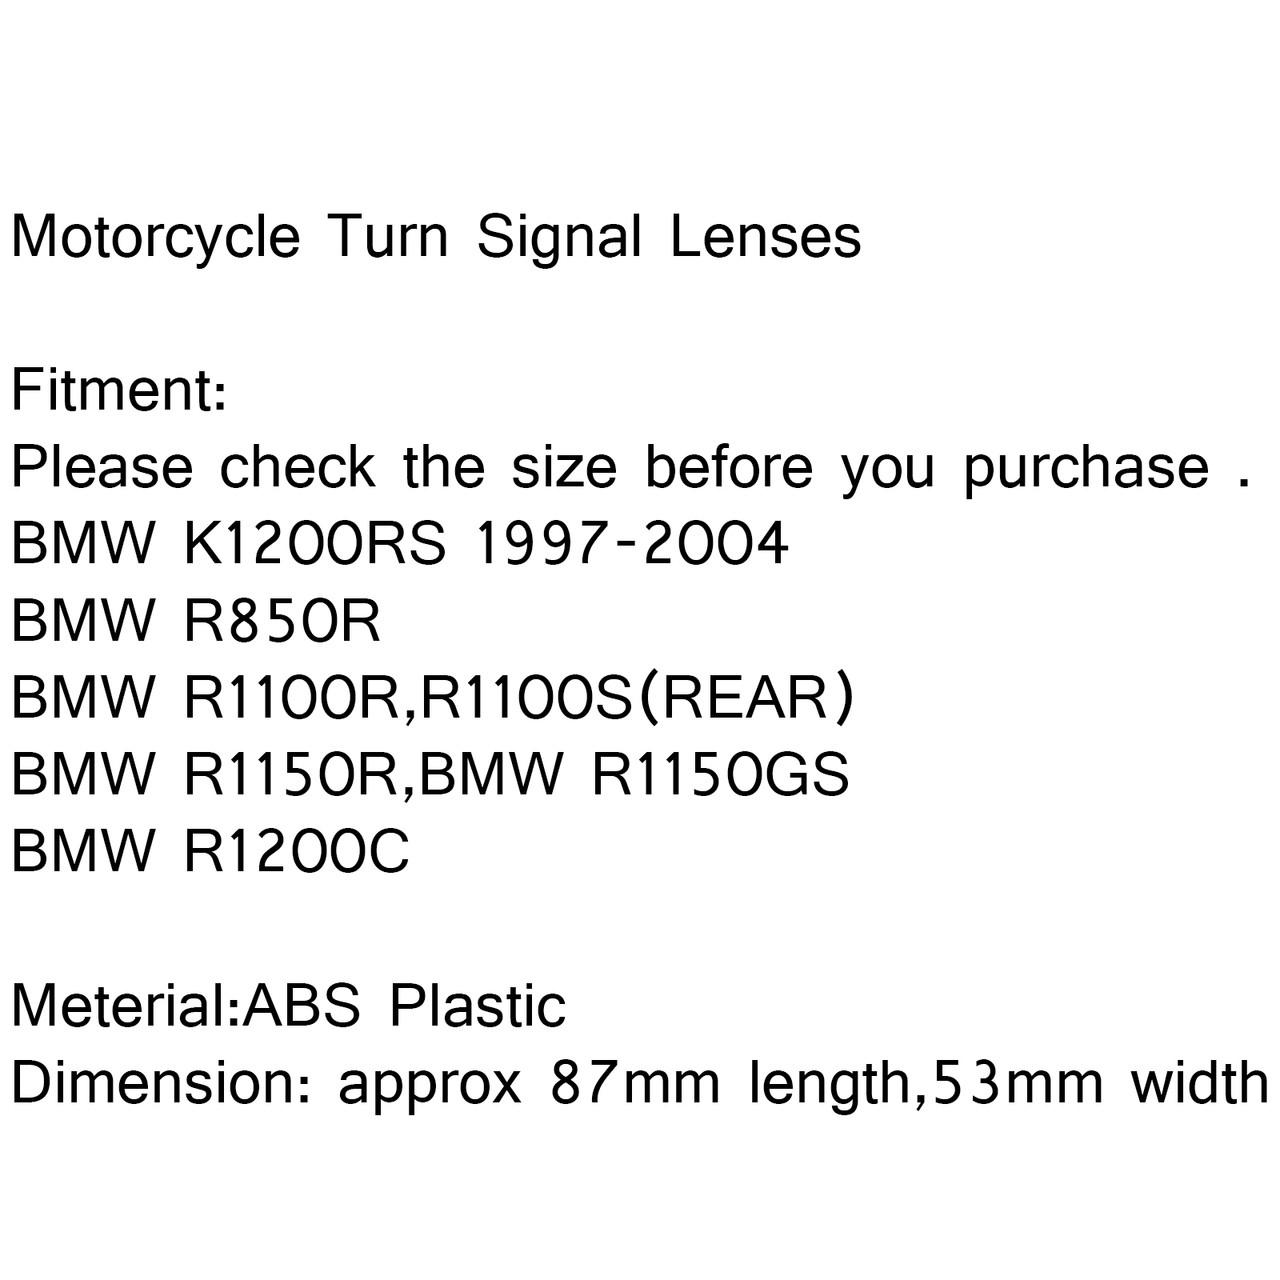 Front Turn Signals Light Lenses BMW K1200RS 1997-2004 R1150R R1150GS R1200C Black